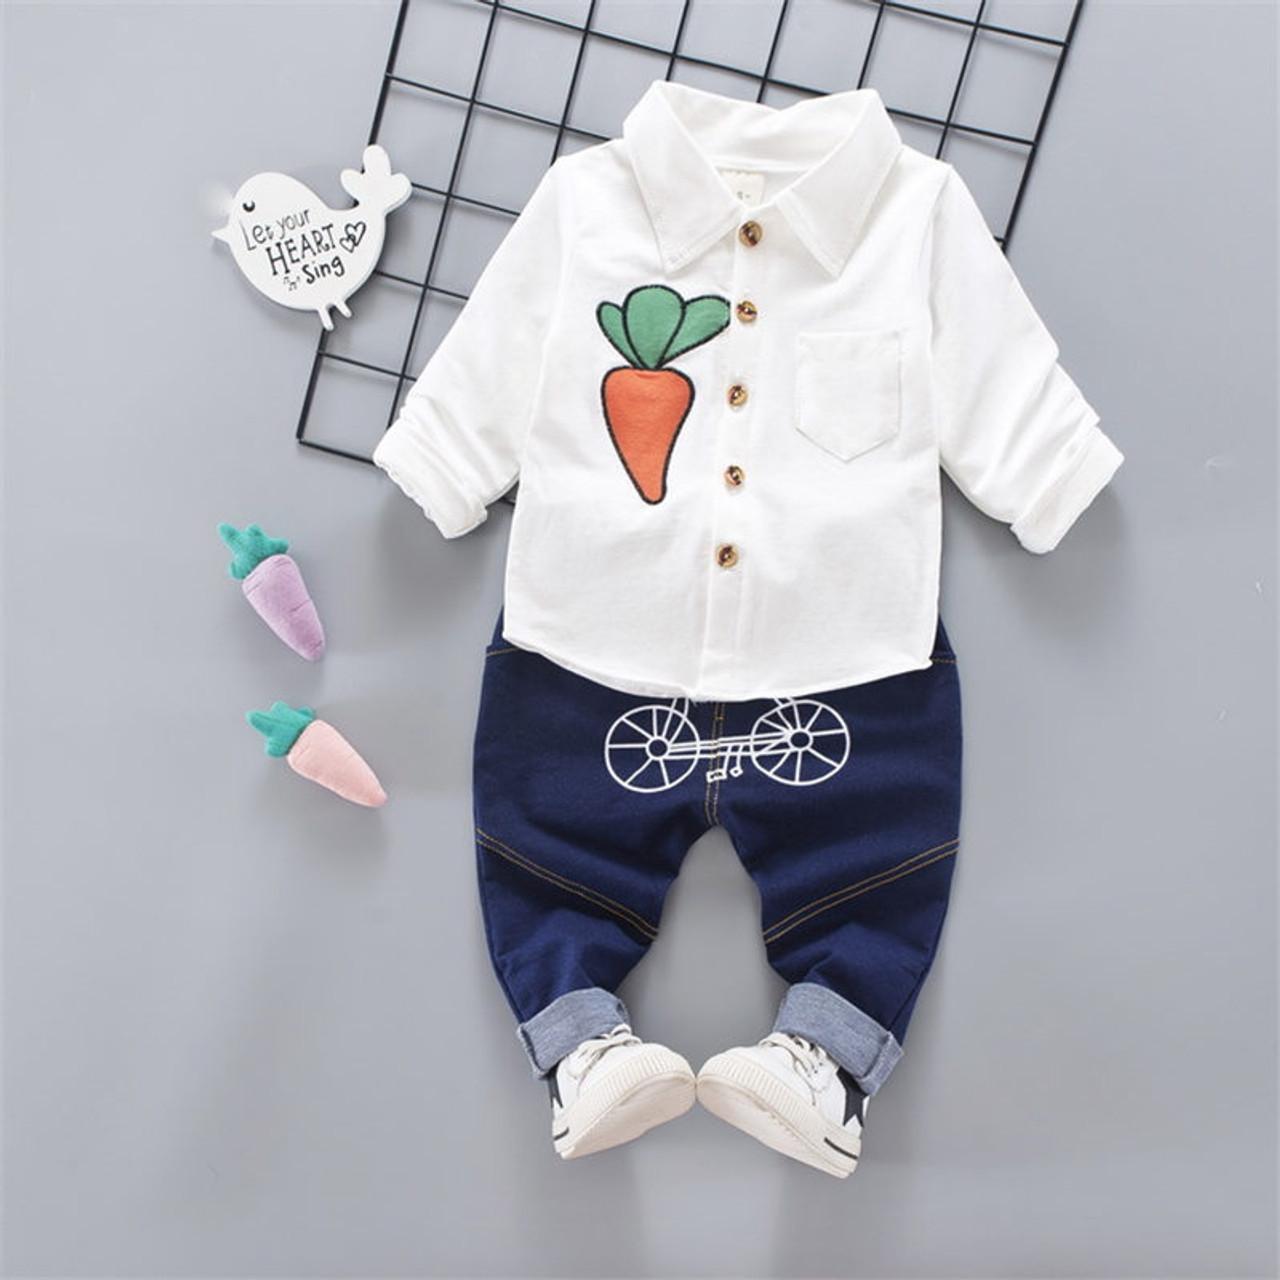 bae8437613d45 ... BibiCola baby boys clothing set pants + shirt children boys clothes sets  carrot pattern kids child ...